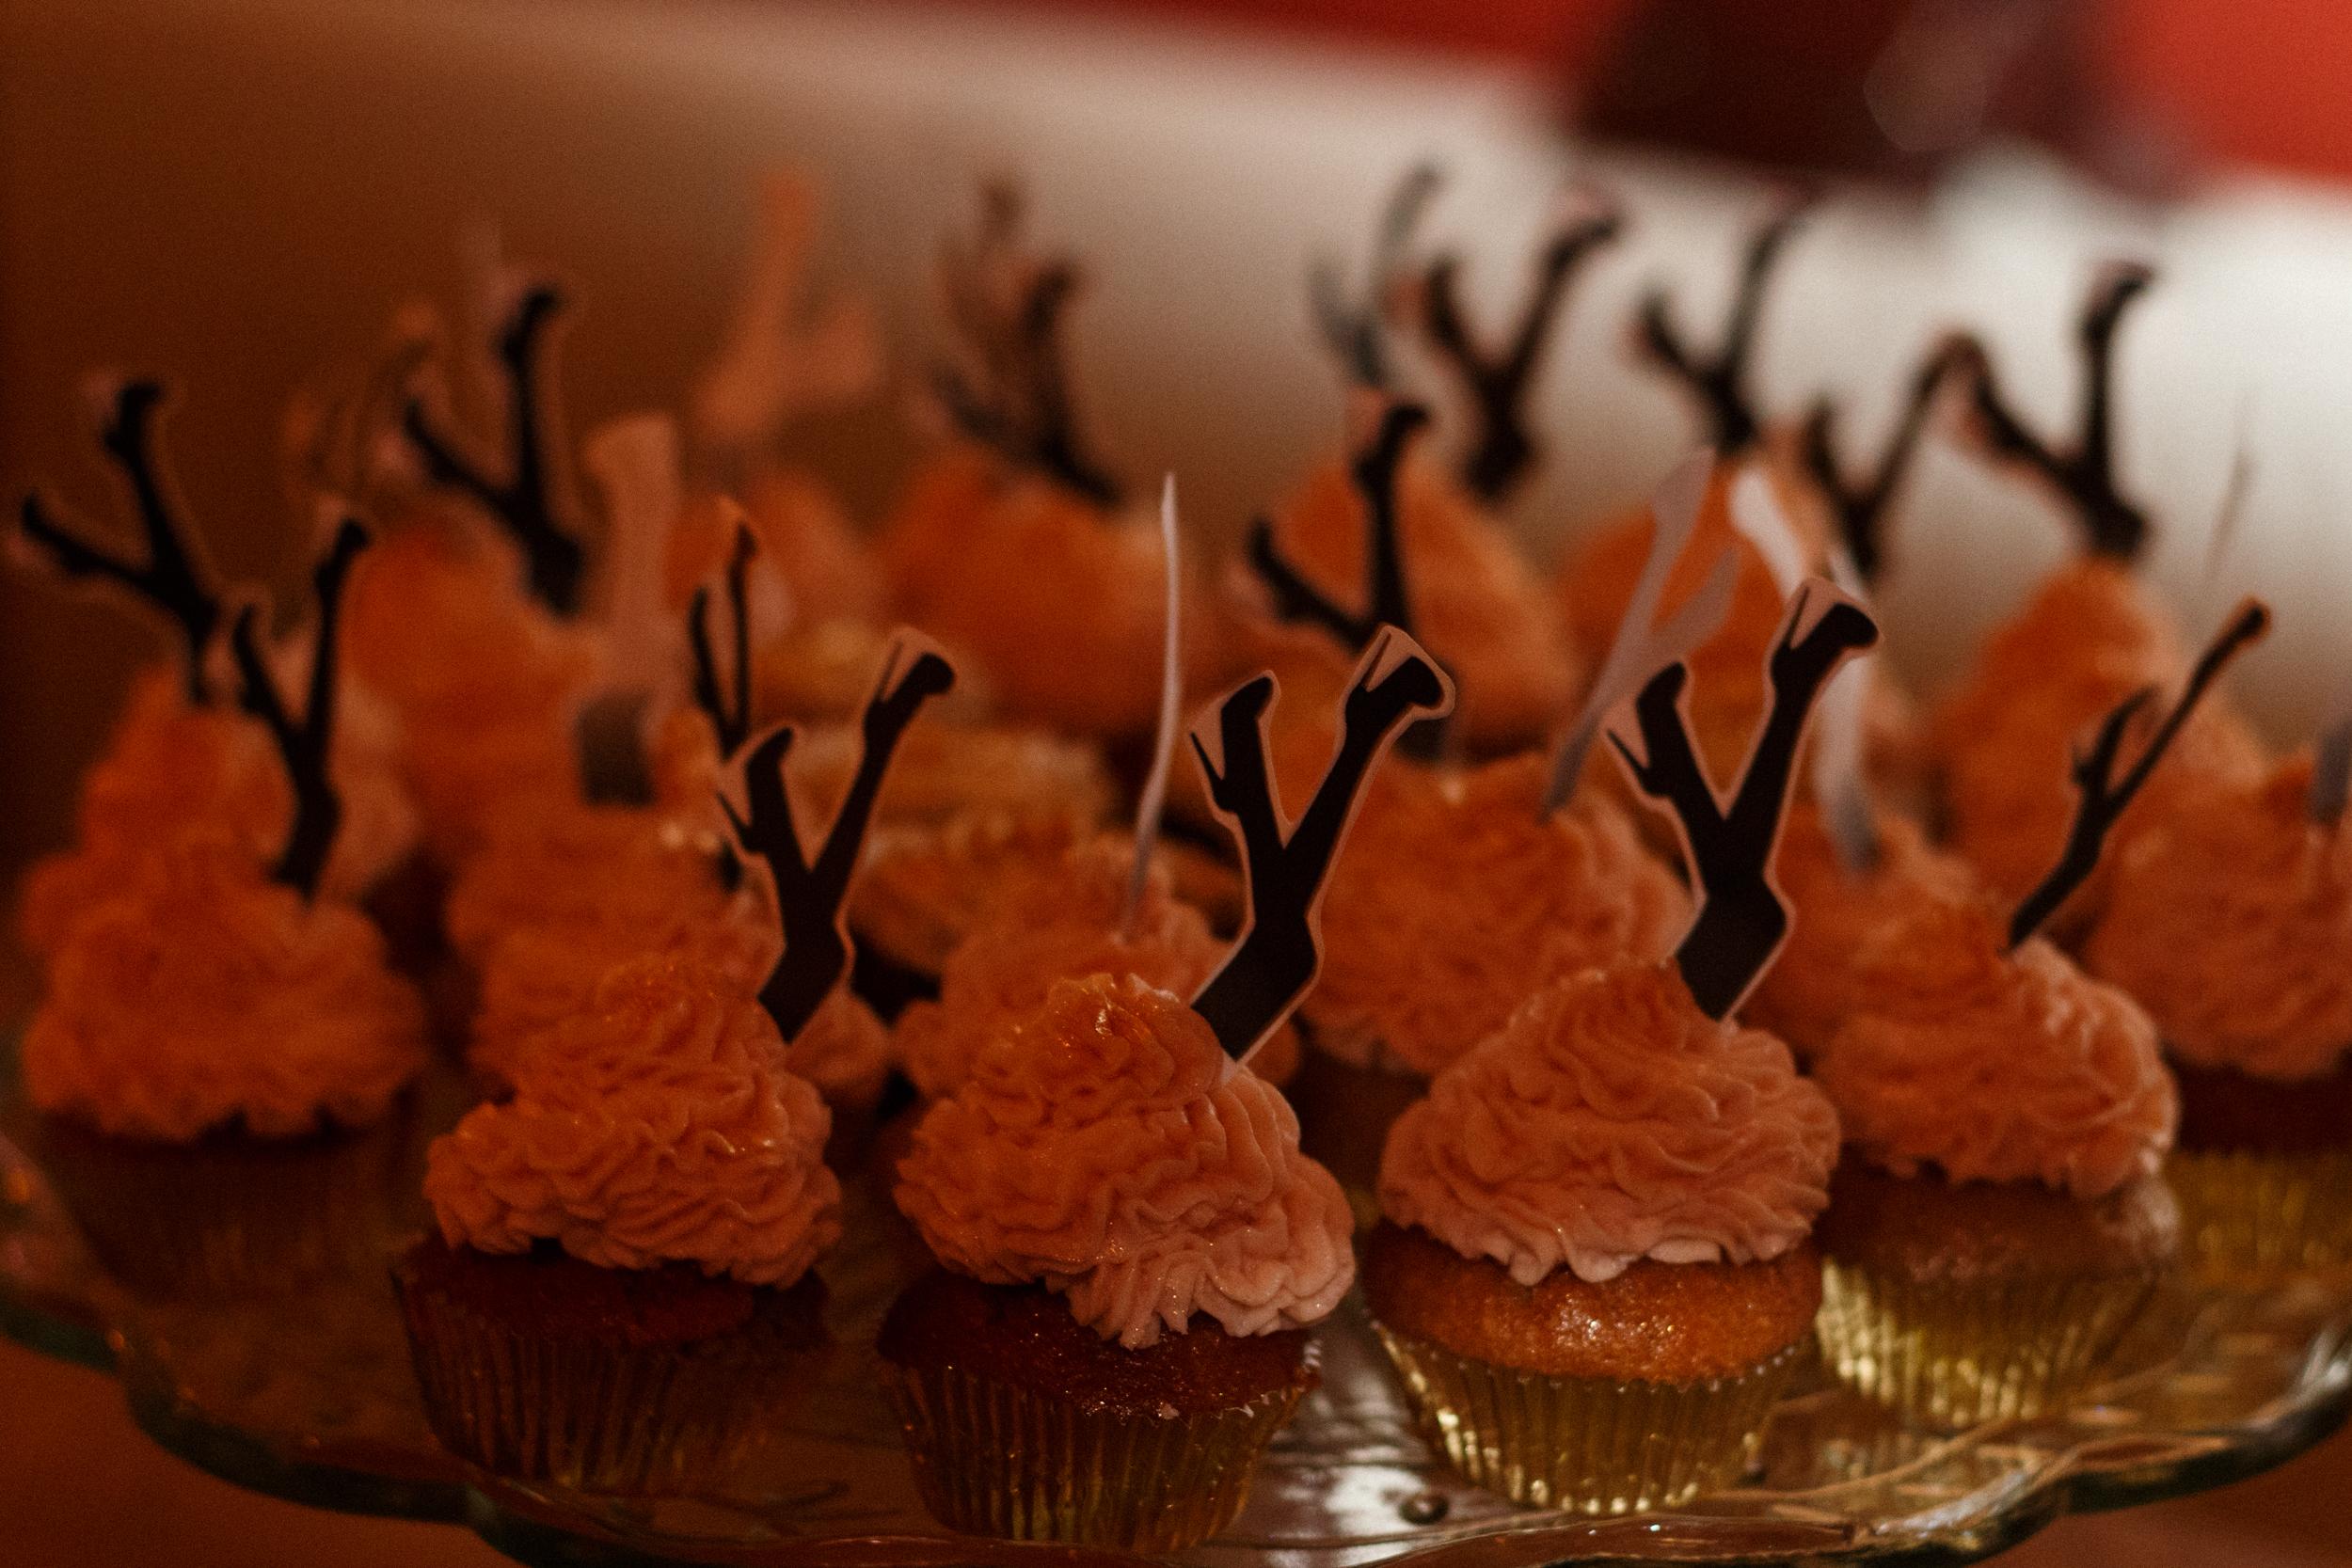 Cupcakes by Alda Villiljós